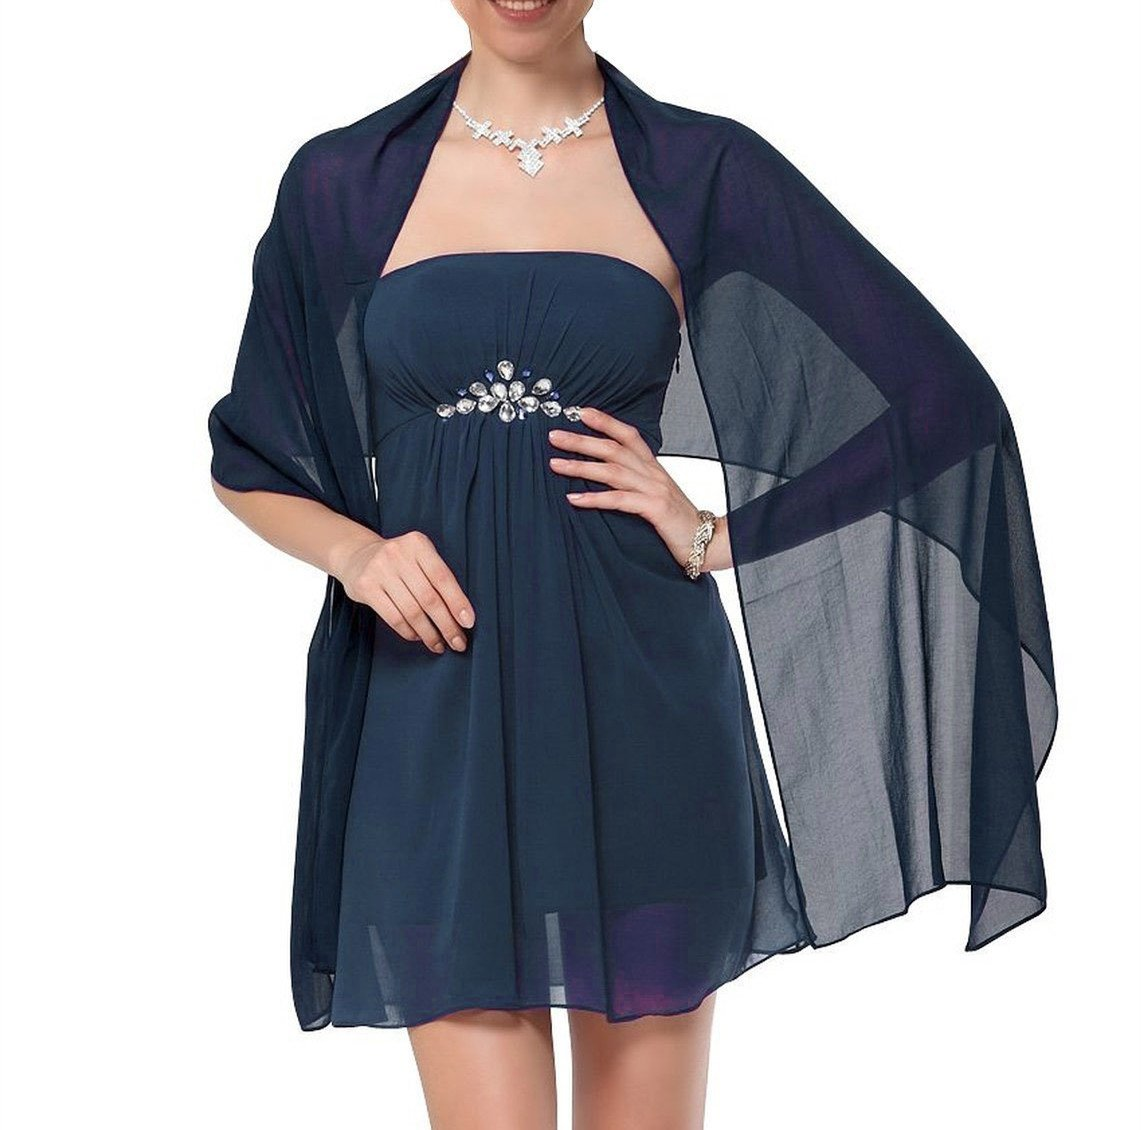 MarryWang Girl chiffon dress shawl and packaging (Dark Navy Blue)